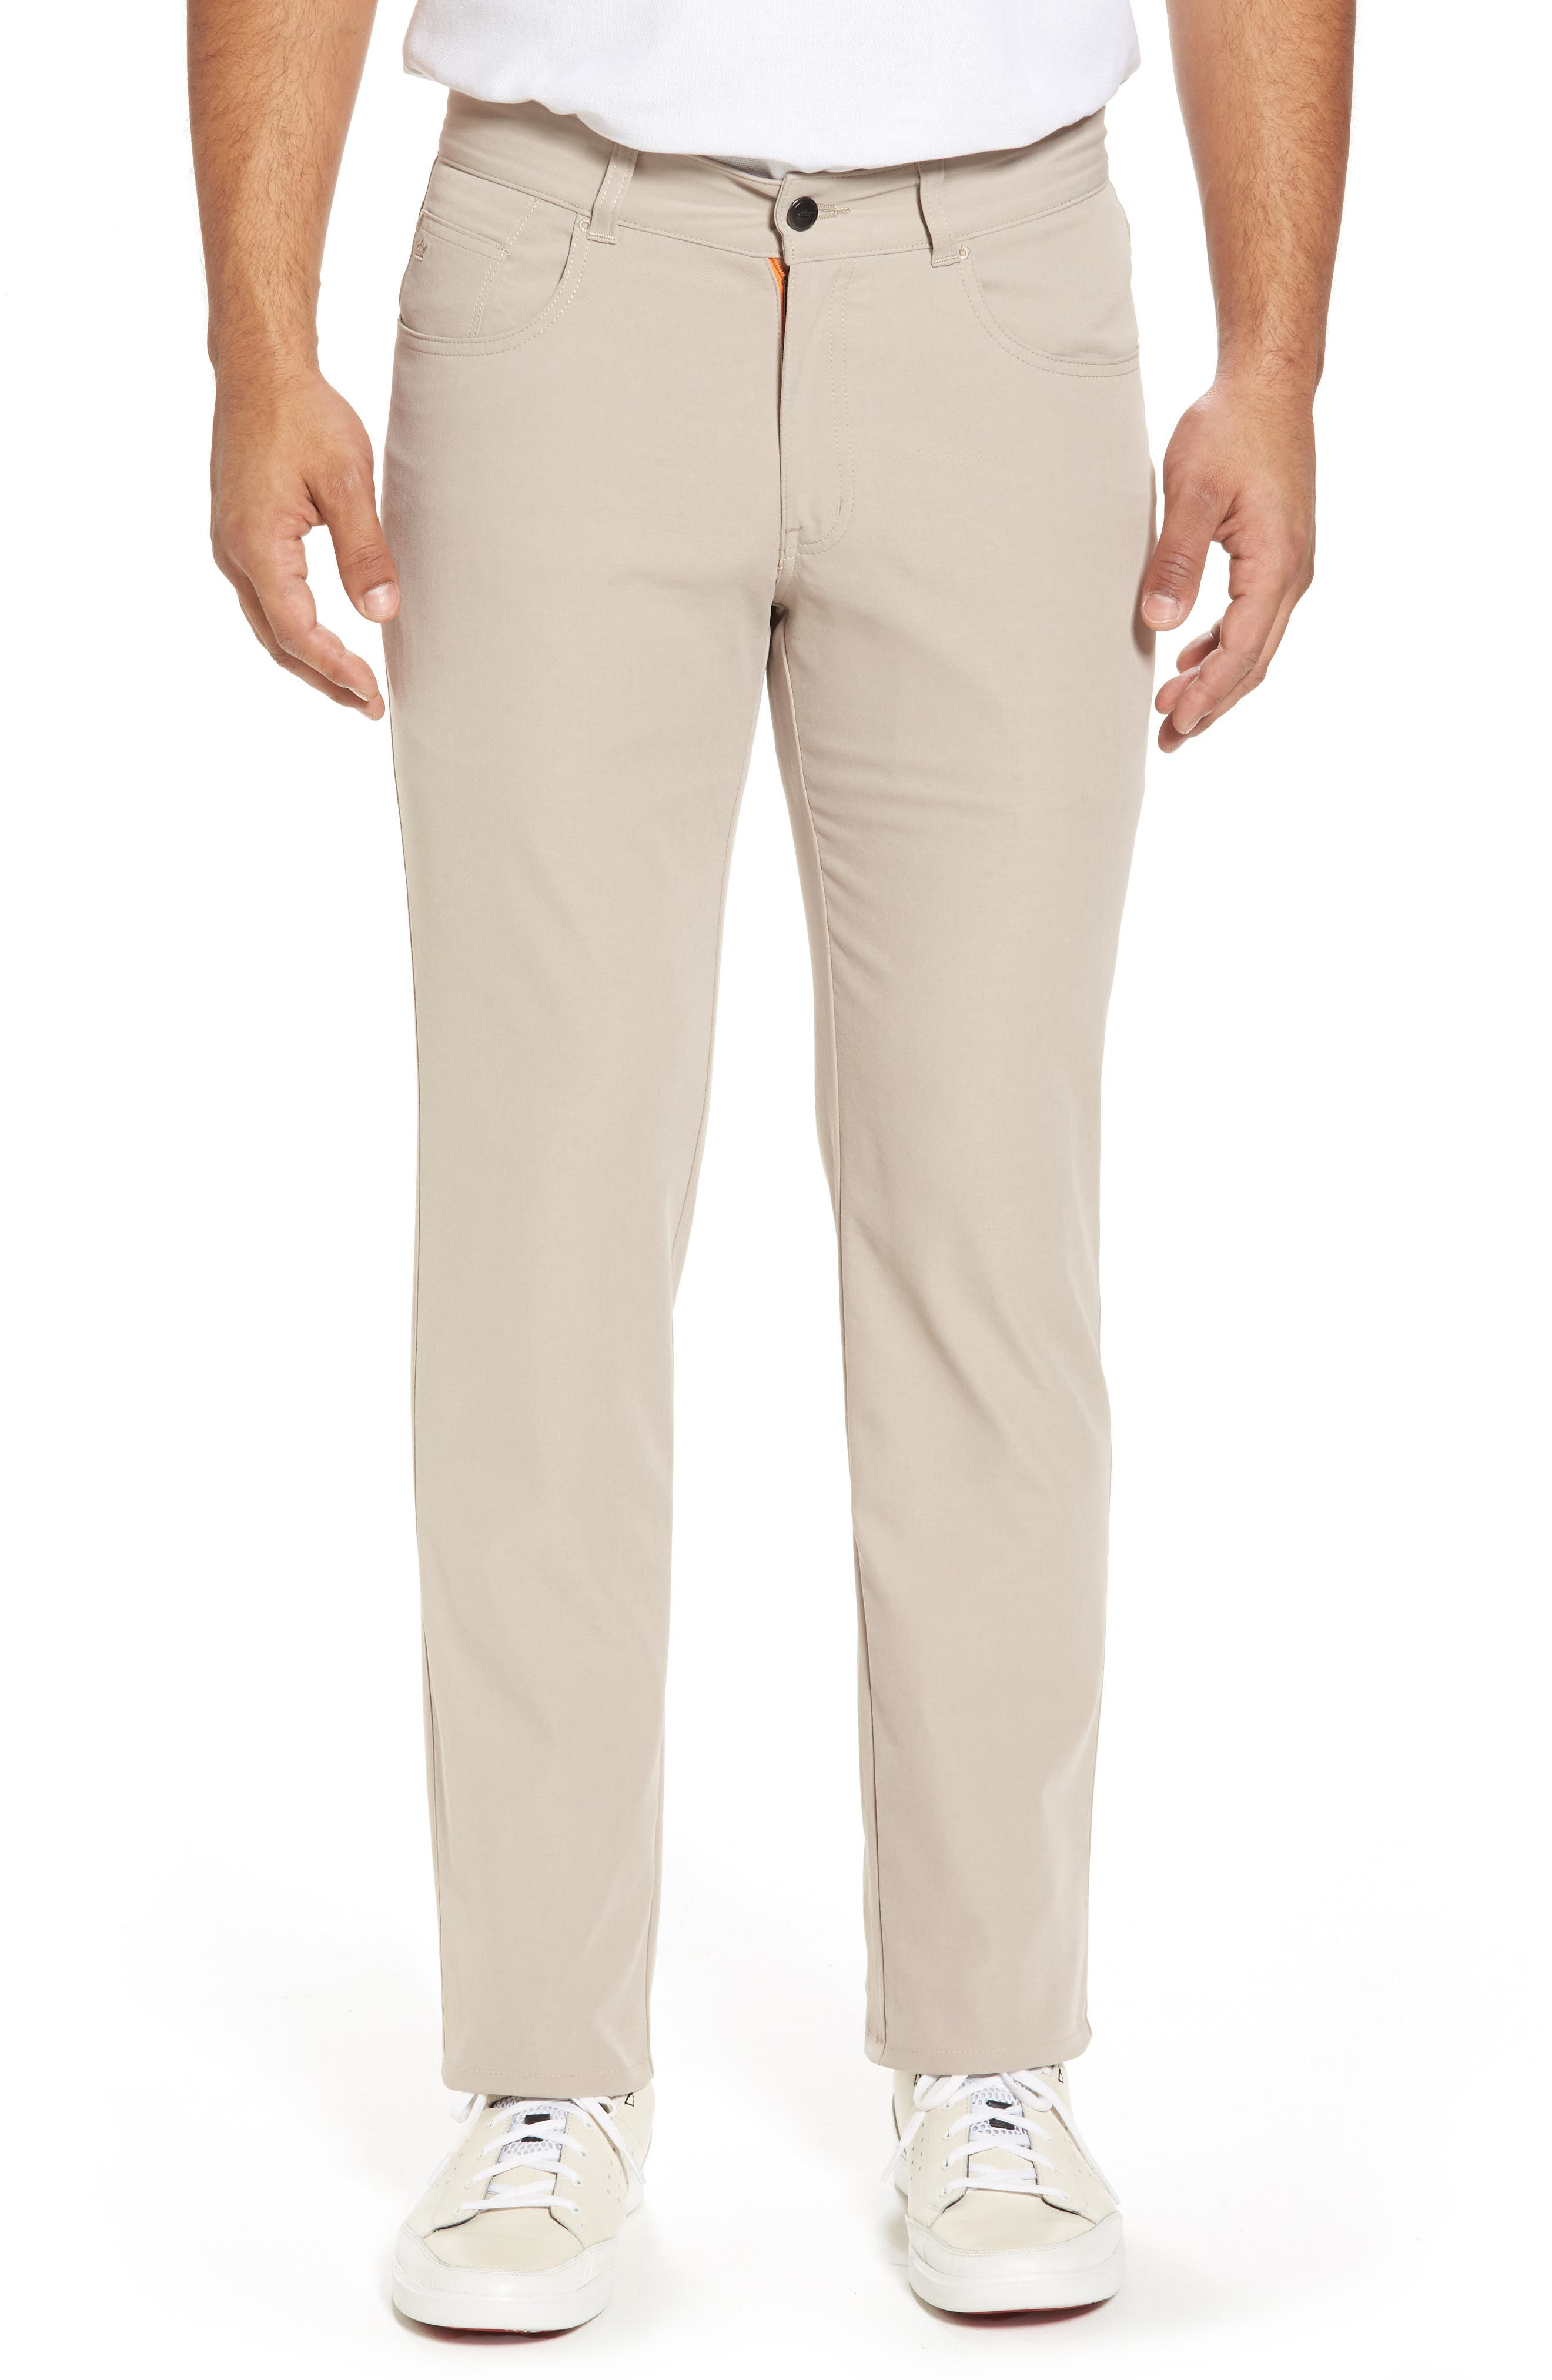 Peter Millar EB66 Performance Six-Pocket Pants